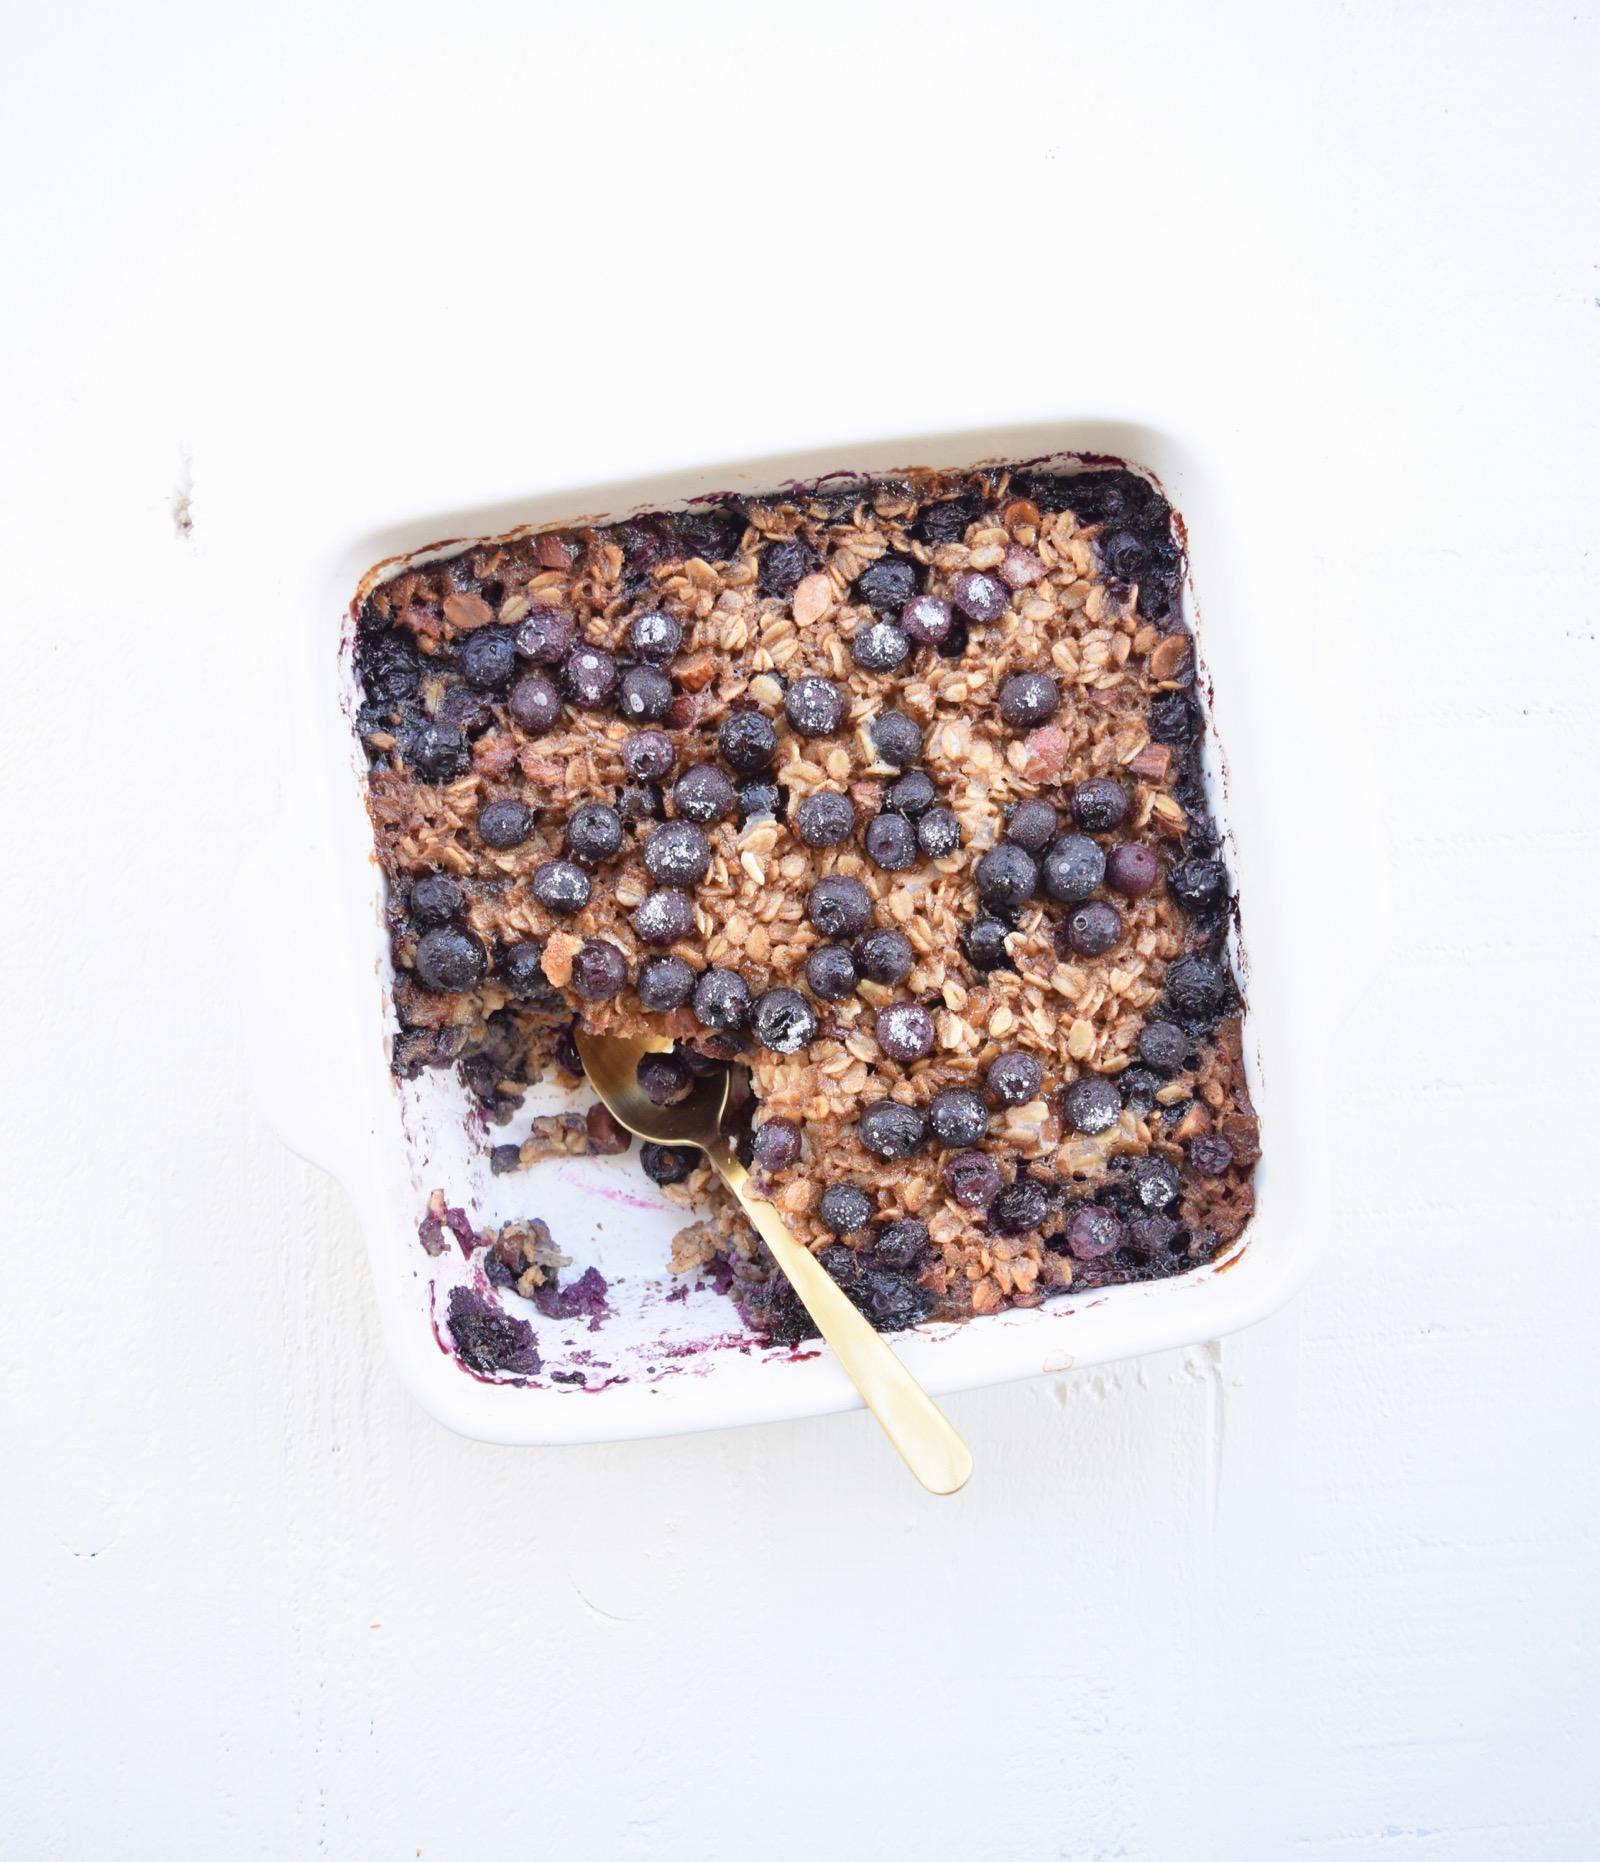 Blueberry Dessert Recipe